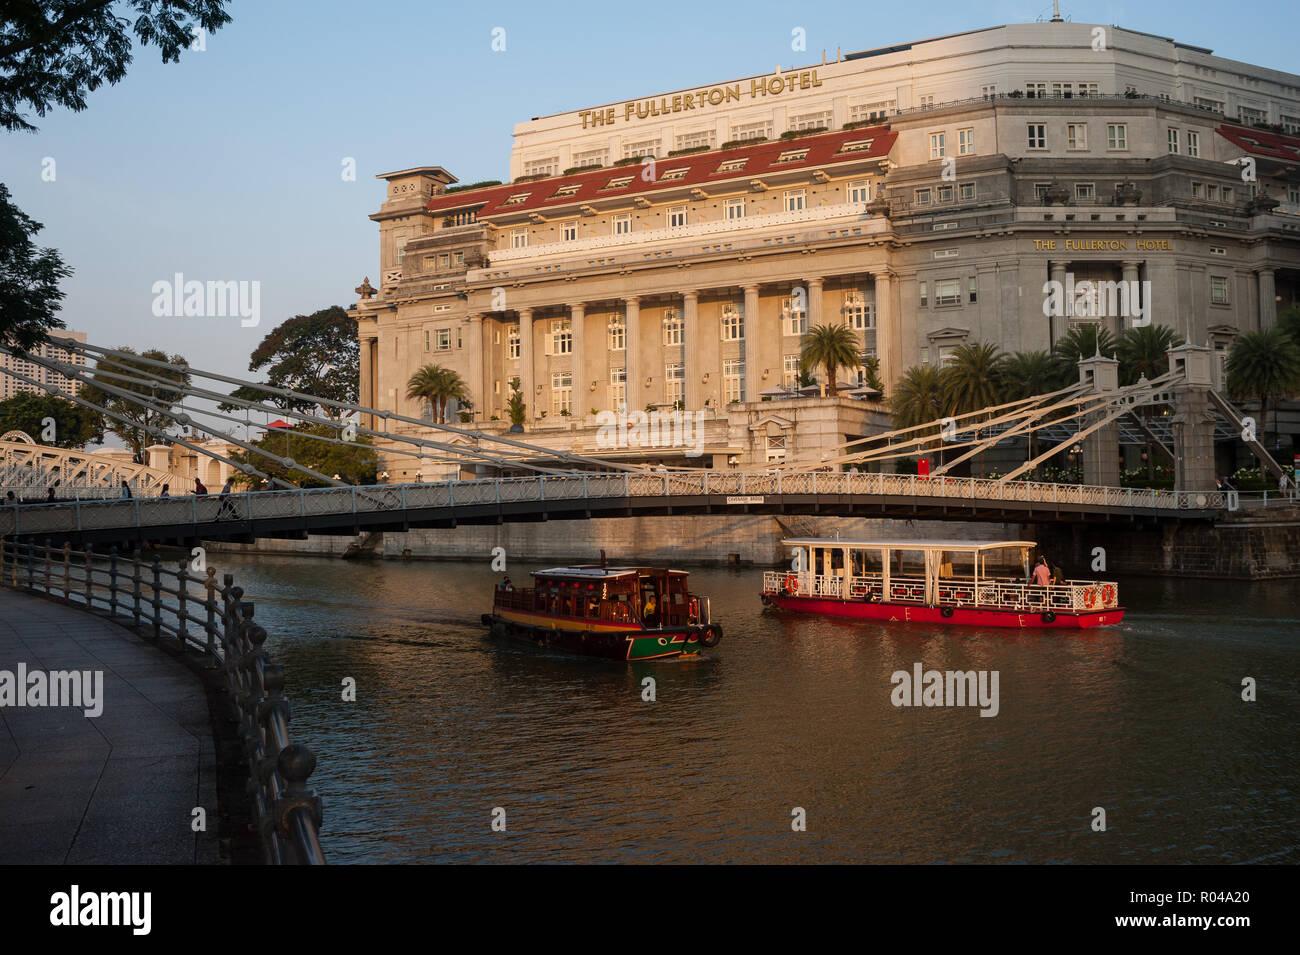 Singapore, Republic of Singapore, The Fullerton Hotel Stock Photo